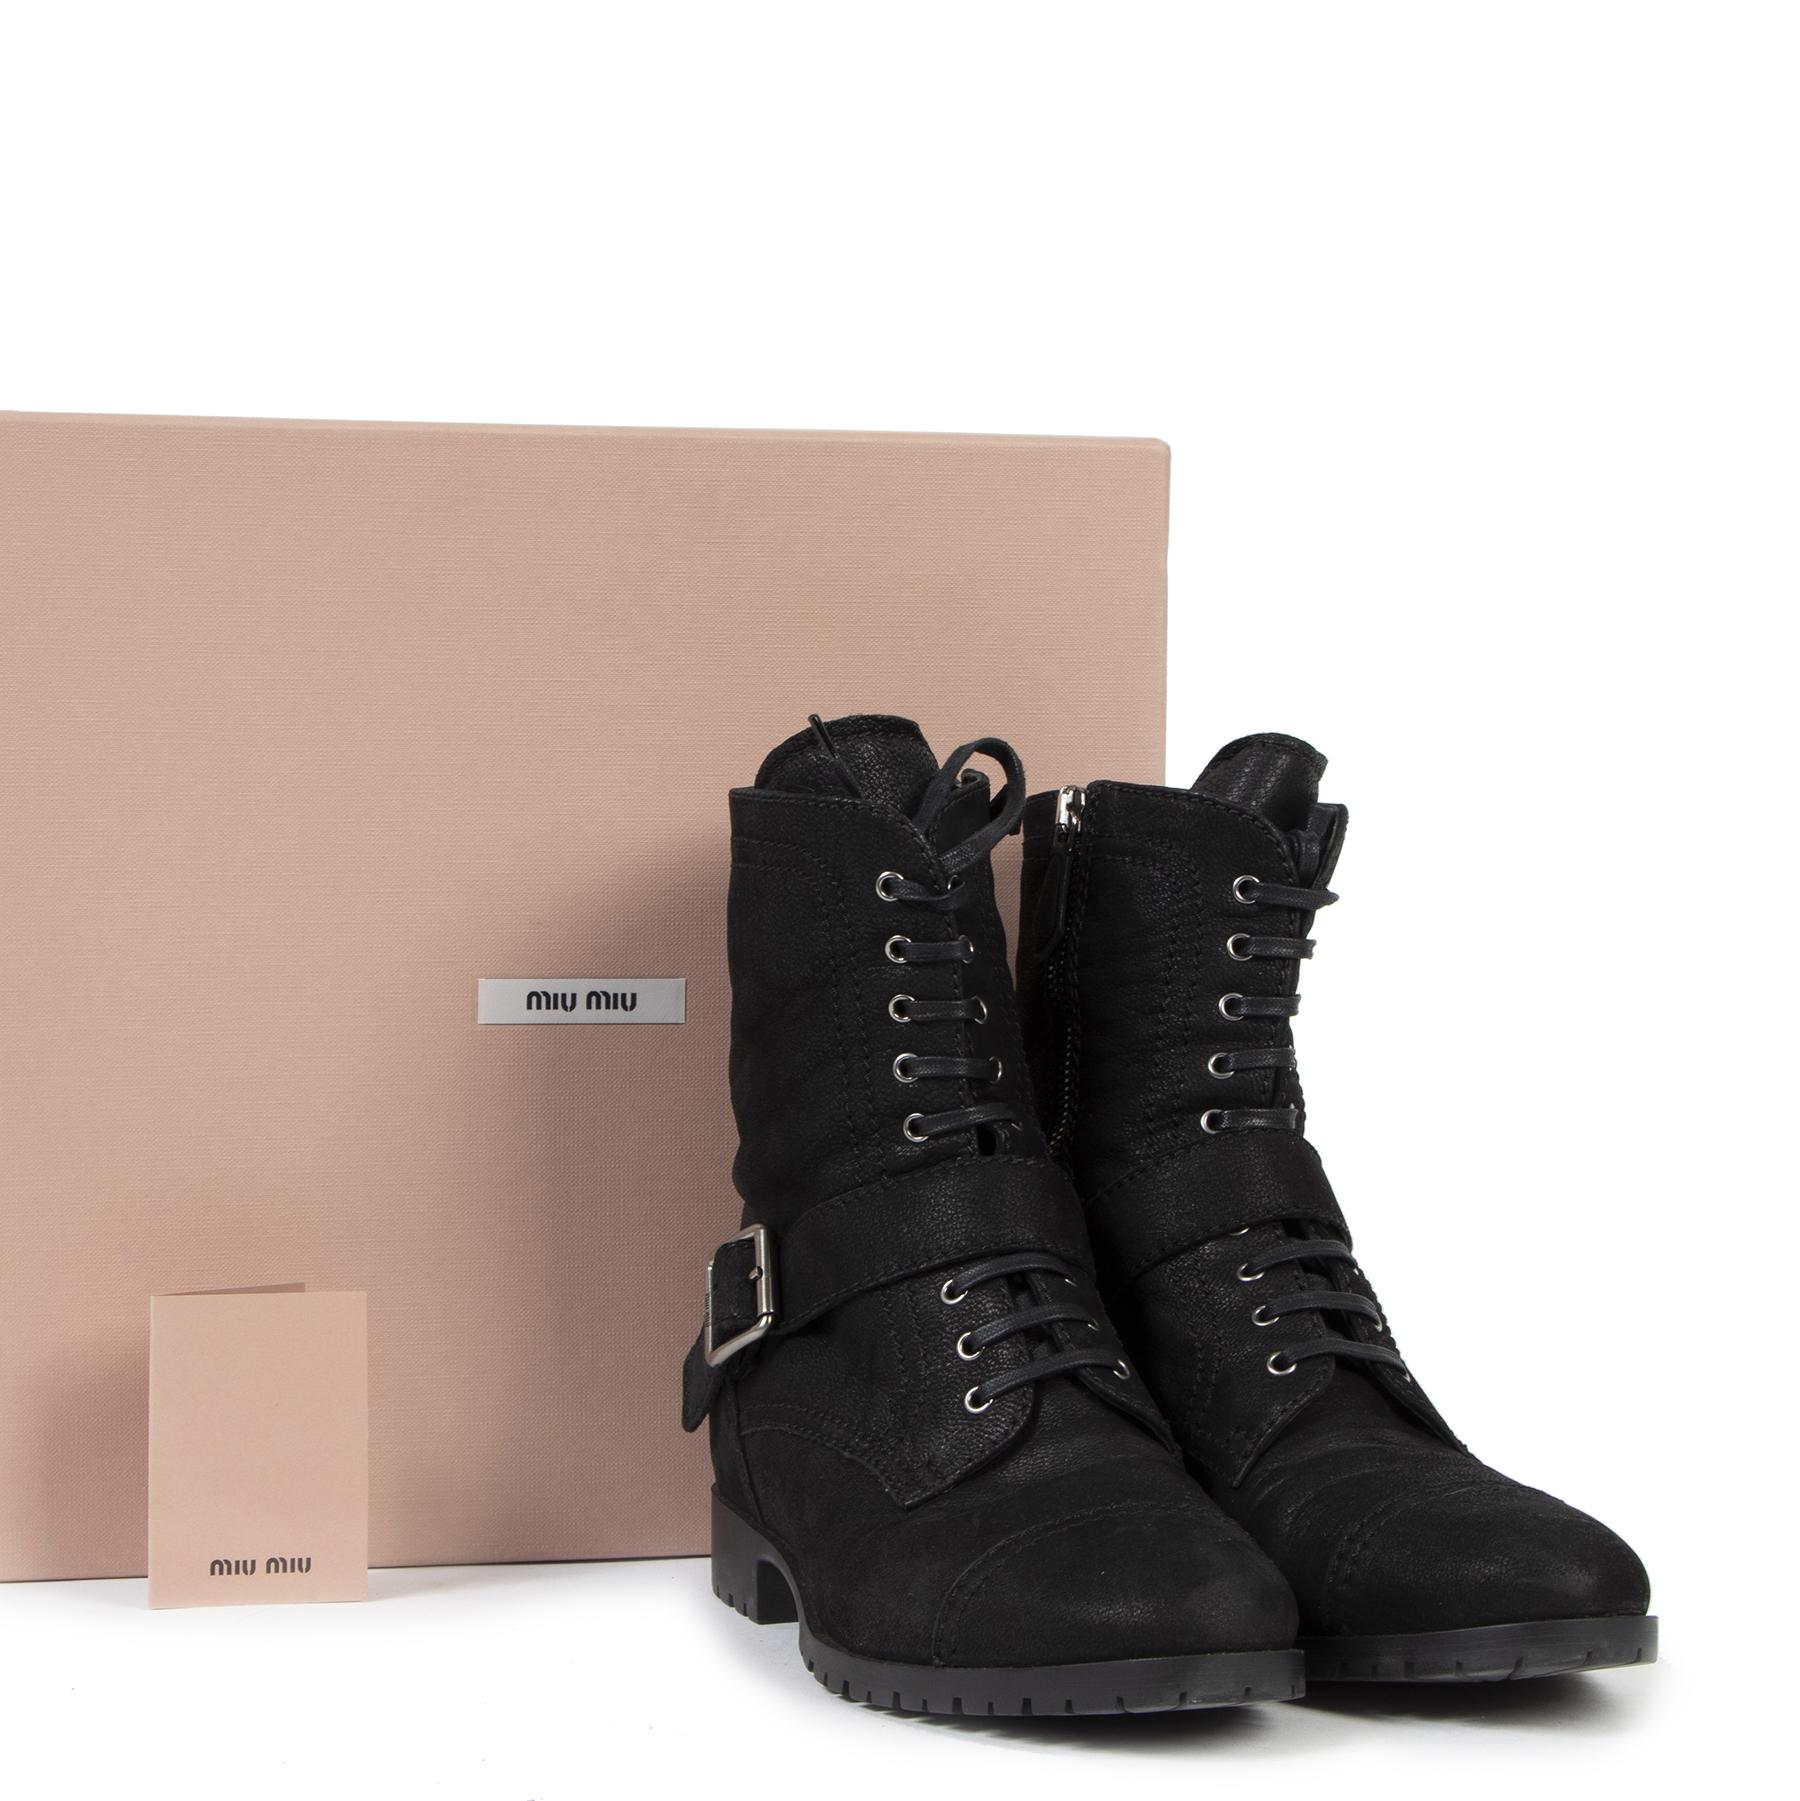 Authentic secondhand Miu Miu Black Leather Boots - Size 39 designer shoes designer brands fashion luxury vintage webshop